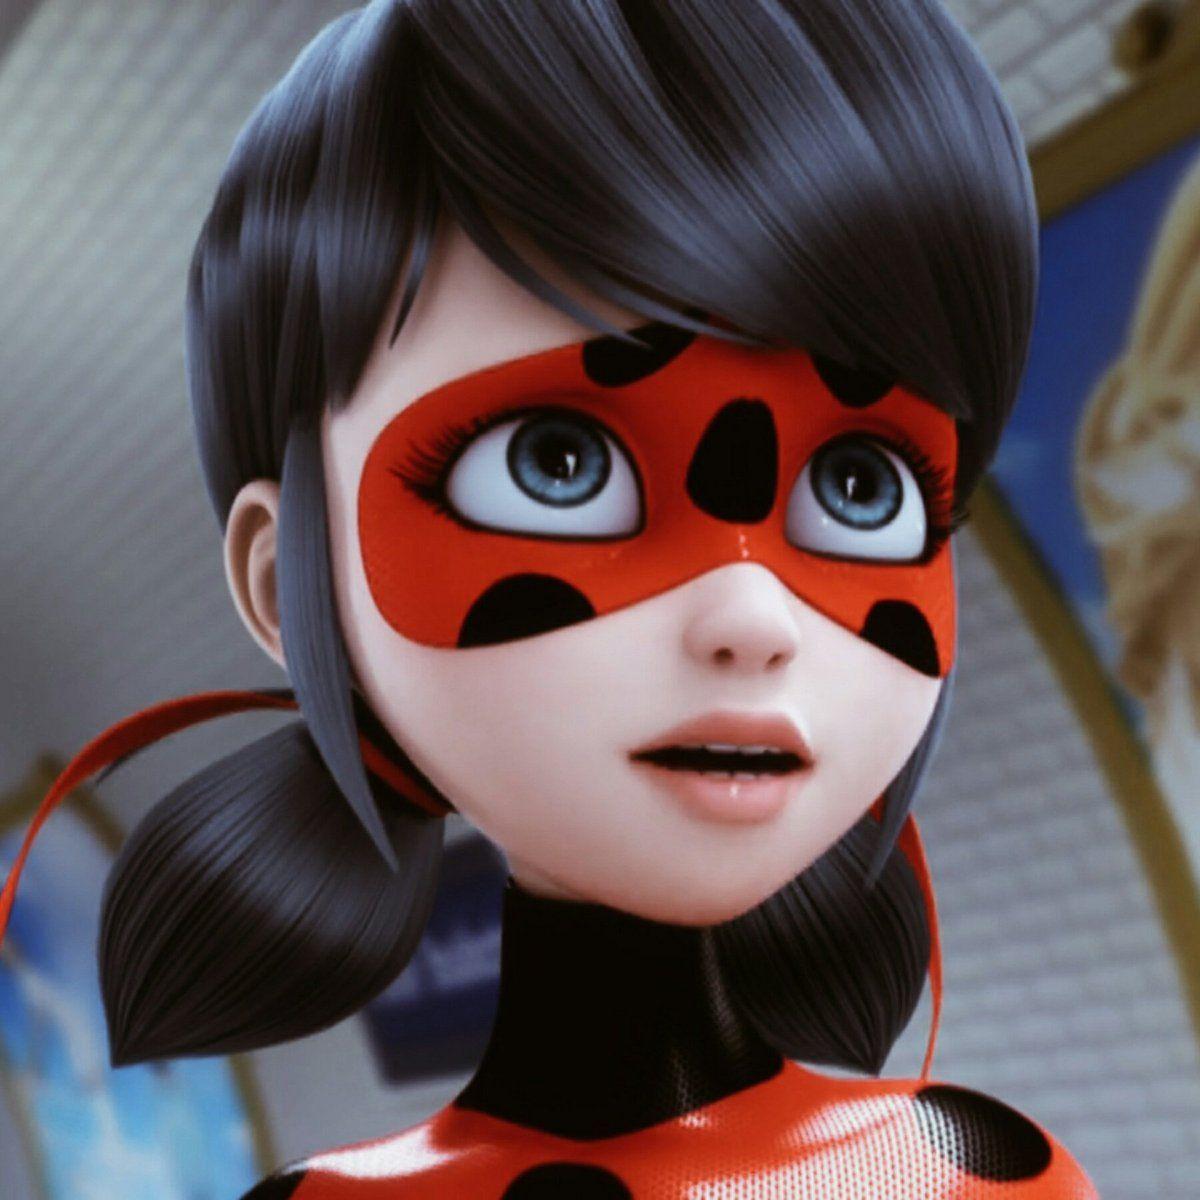 She Is So Pretty Coisas Da Ladybug Arlequina Frases